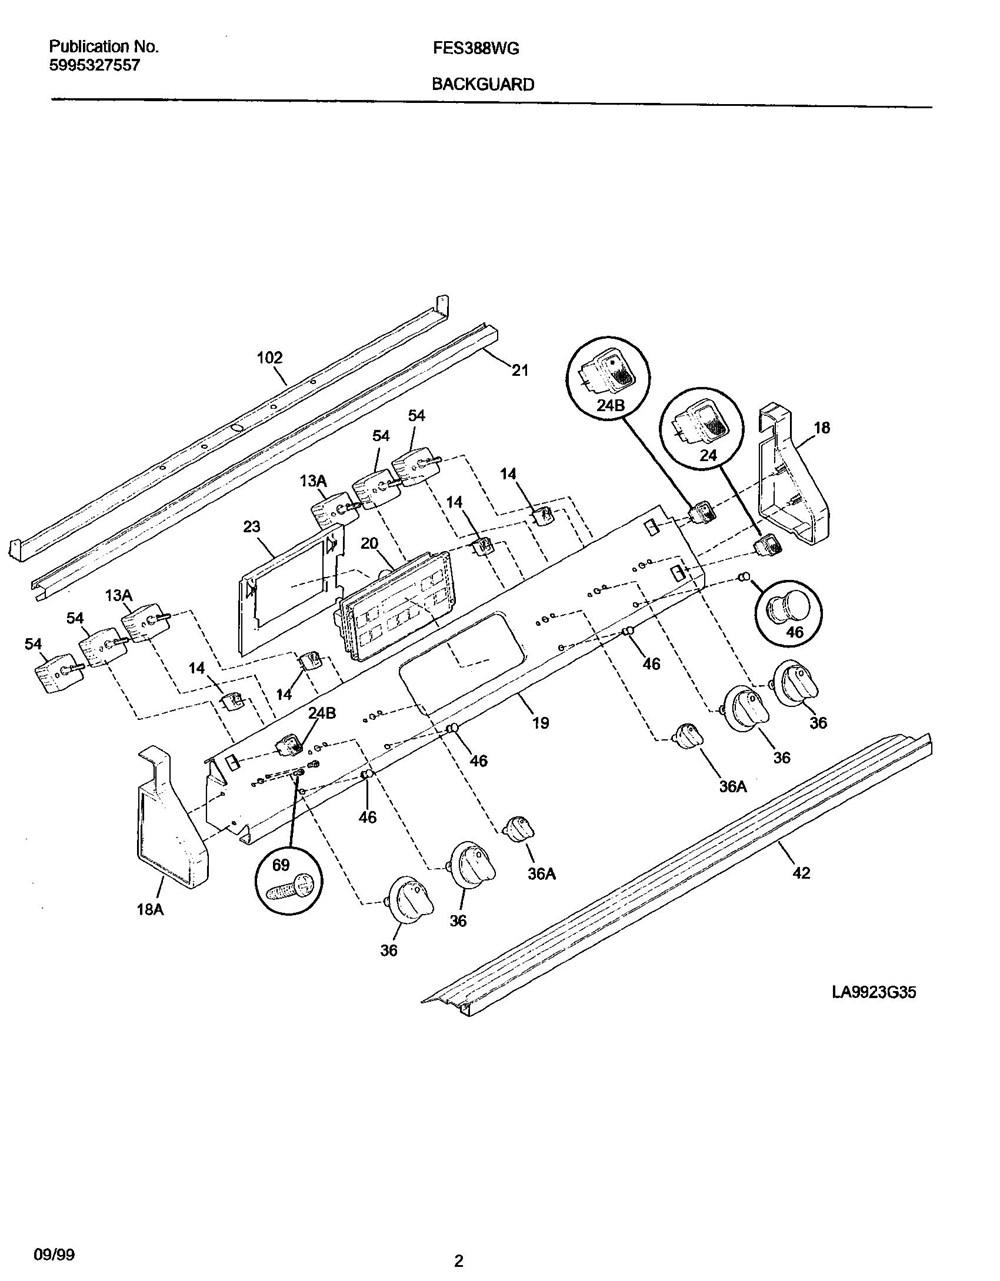 Fes388wgcg Frigidaire Company Backguard 05body 07top Drawer 09door 01cover 10wiring Diagram